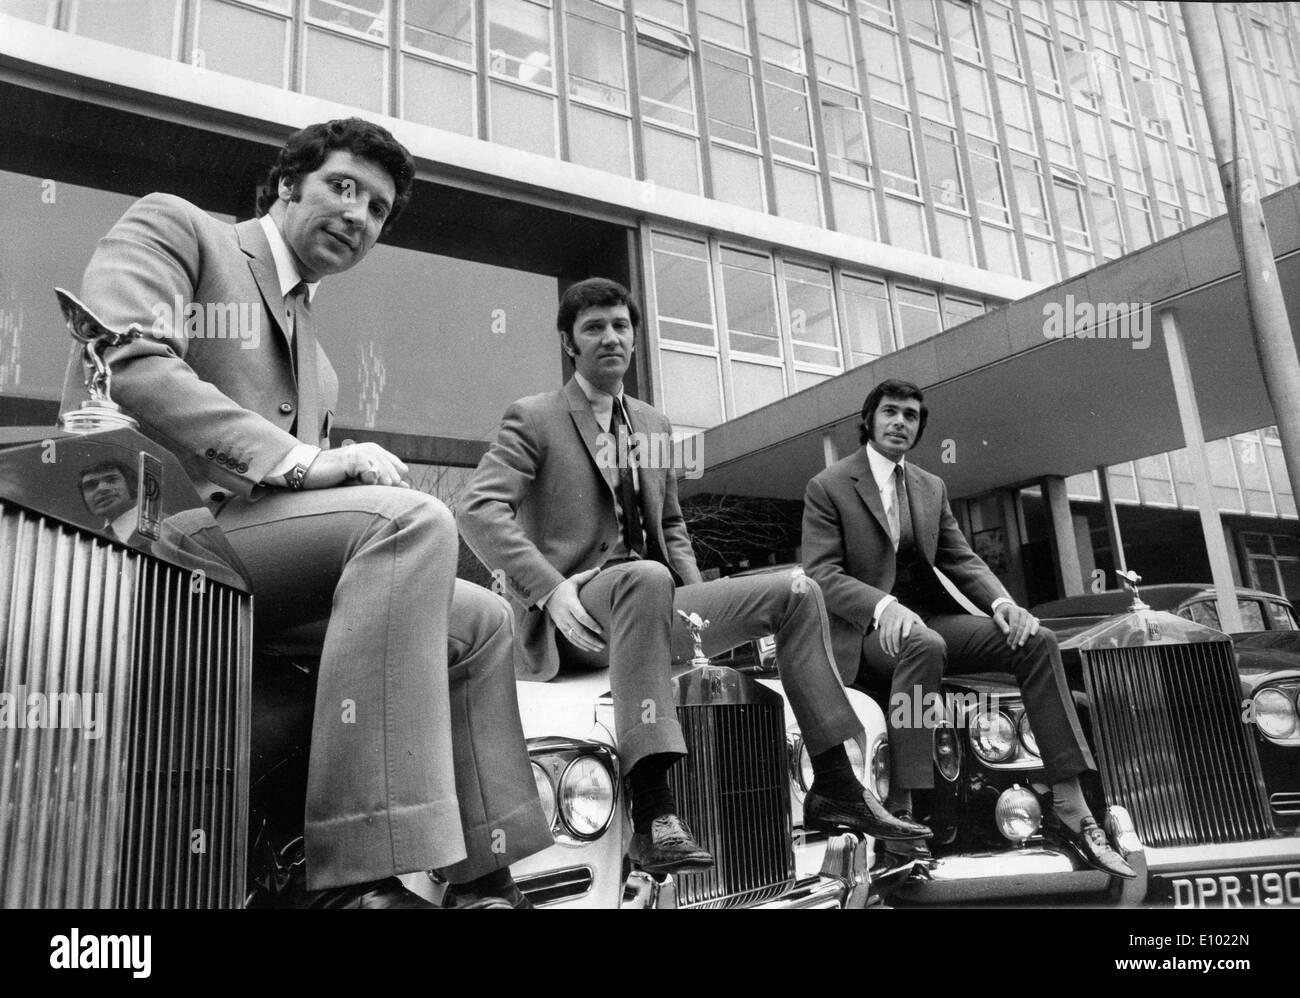 Tom Jones and friends pose on Rolls Royce - Stock Image